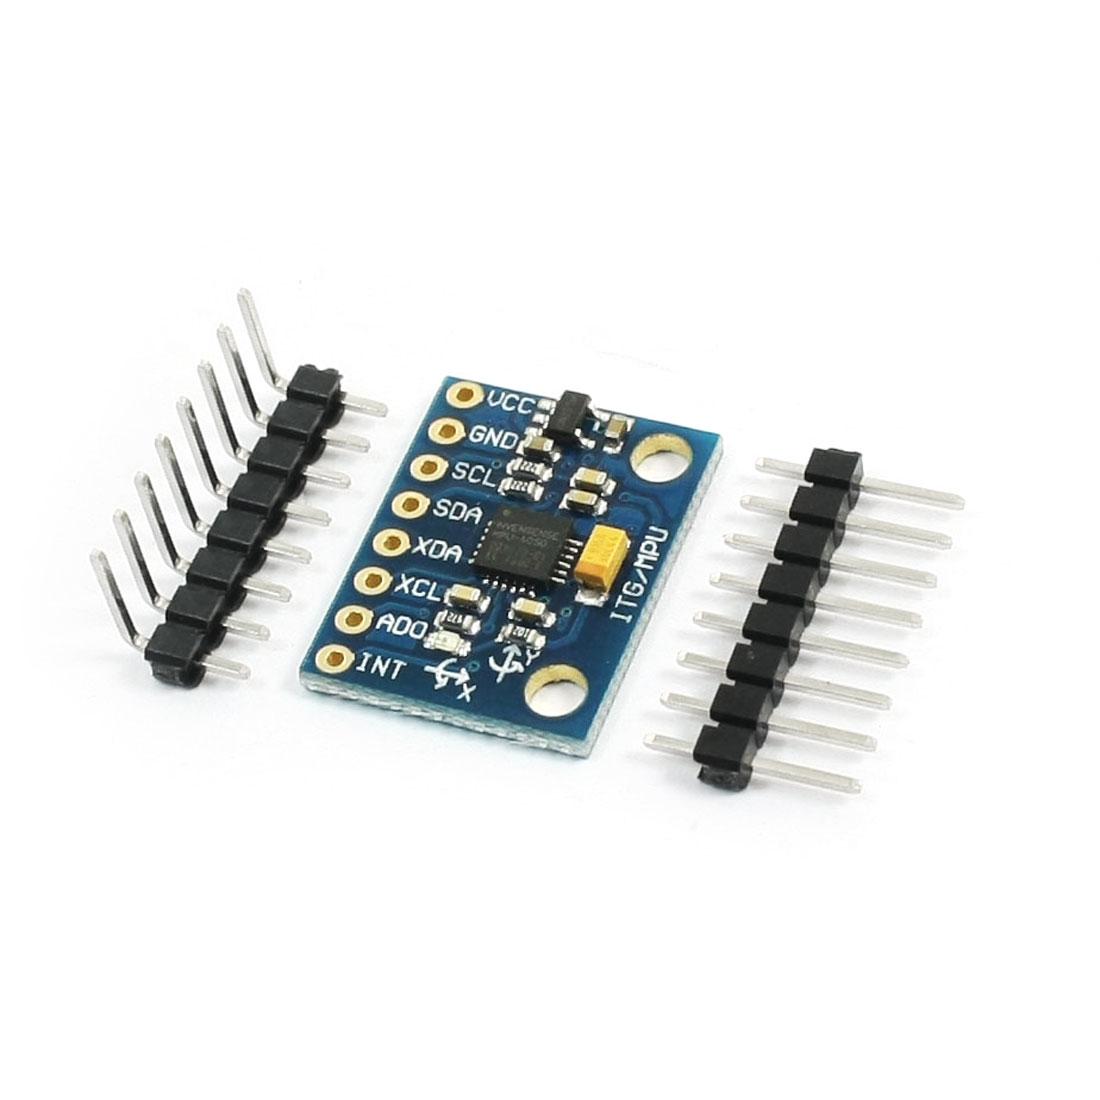 GY-521 MPU-6050 Gyro Module Triaxial Accelerometer 3-5V